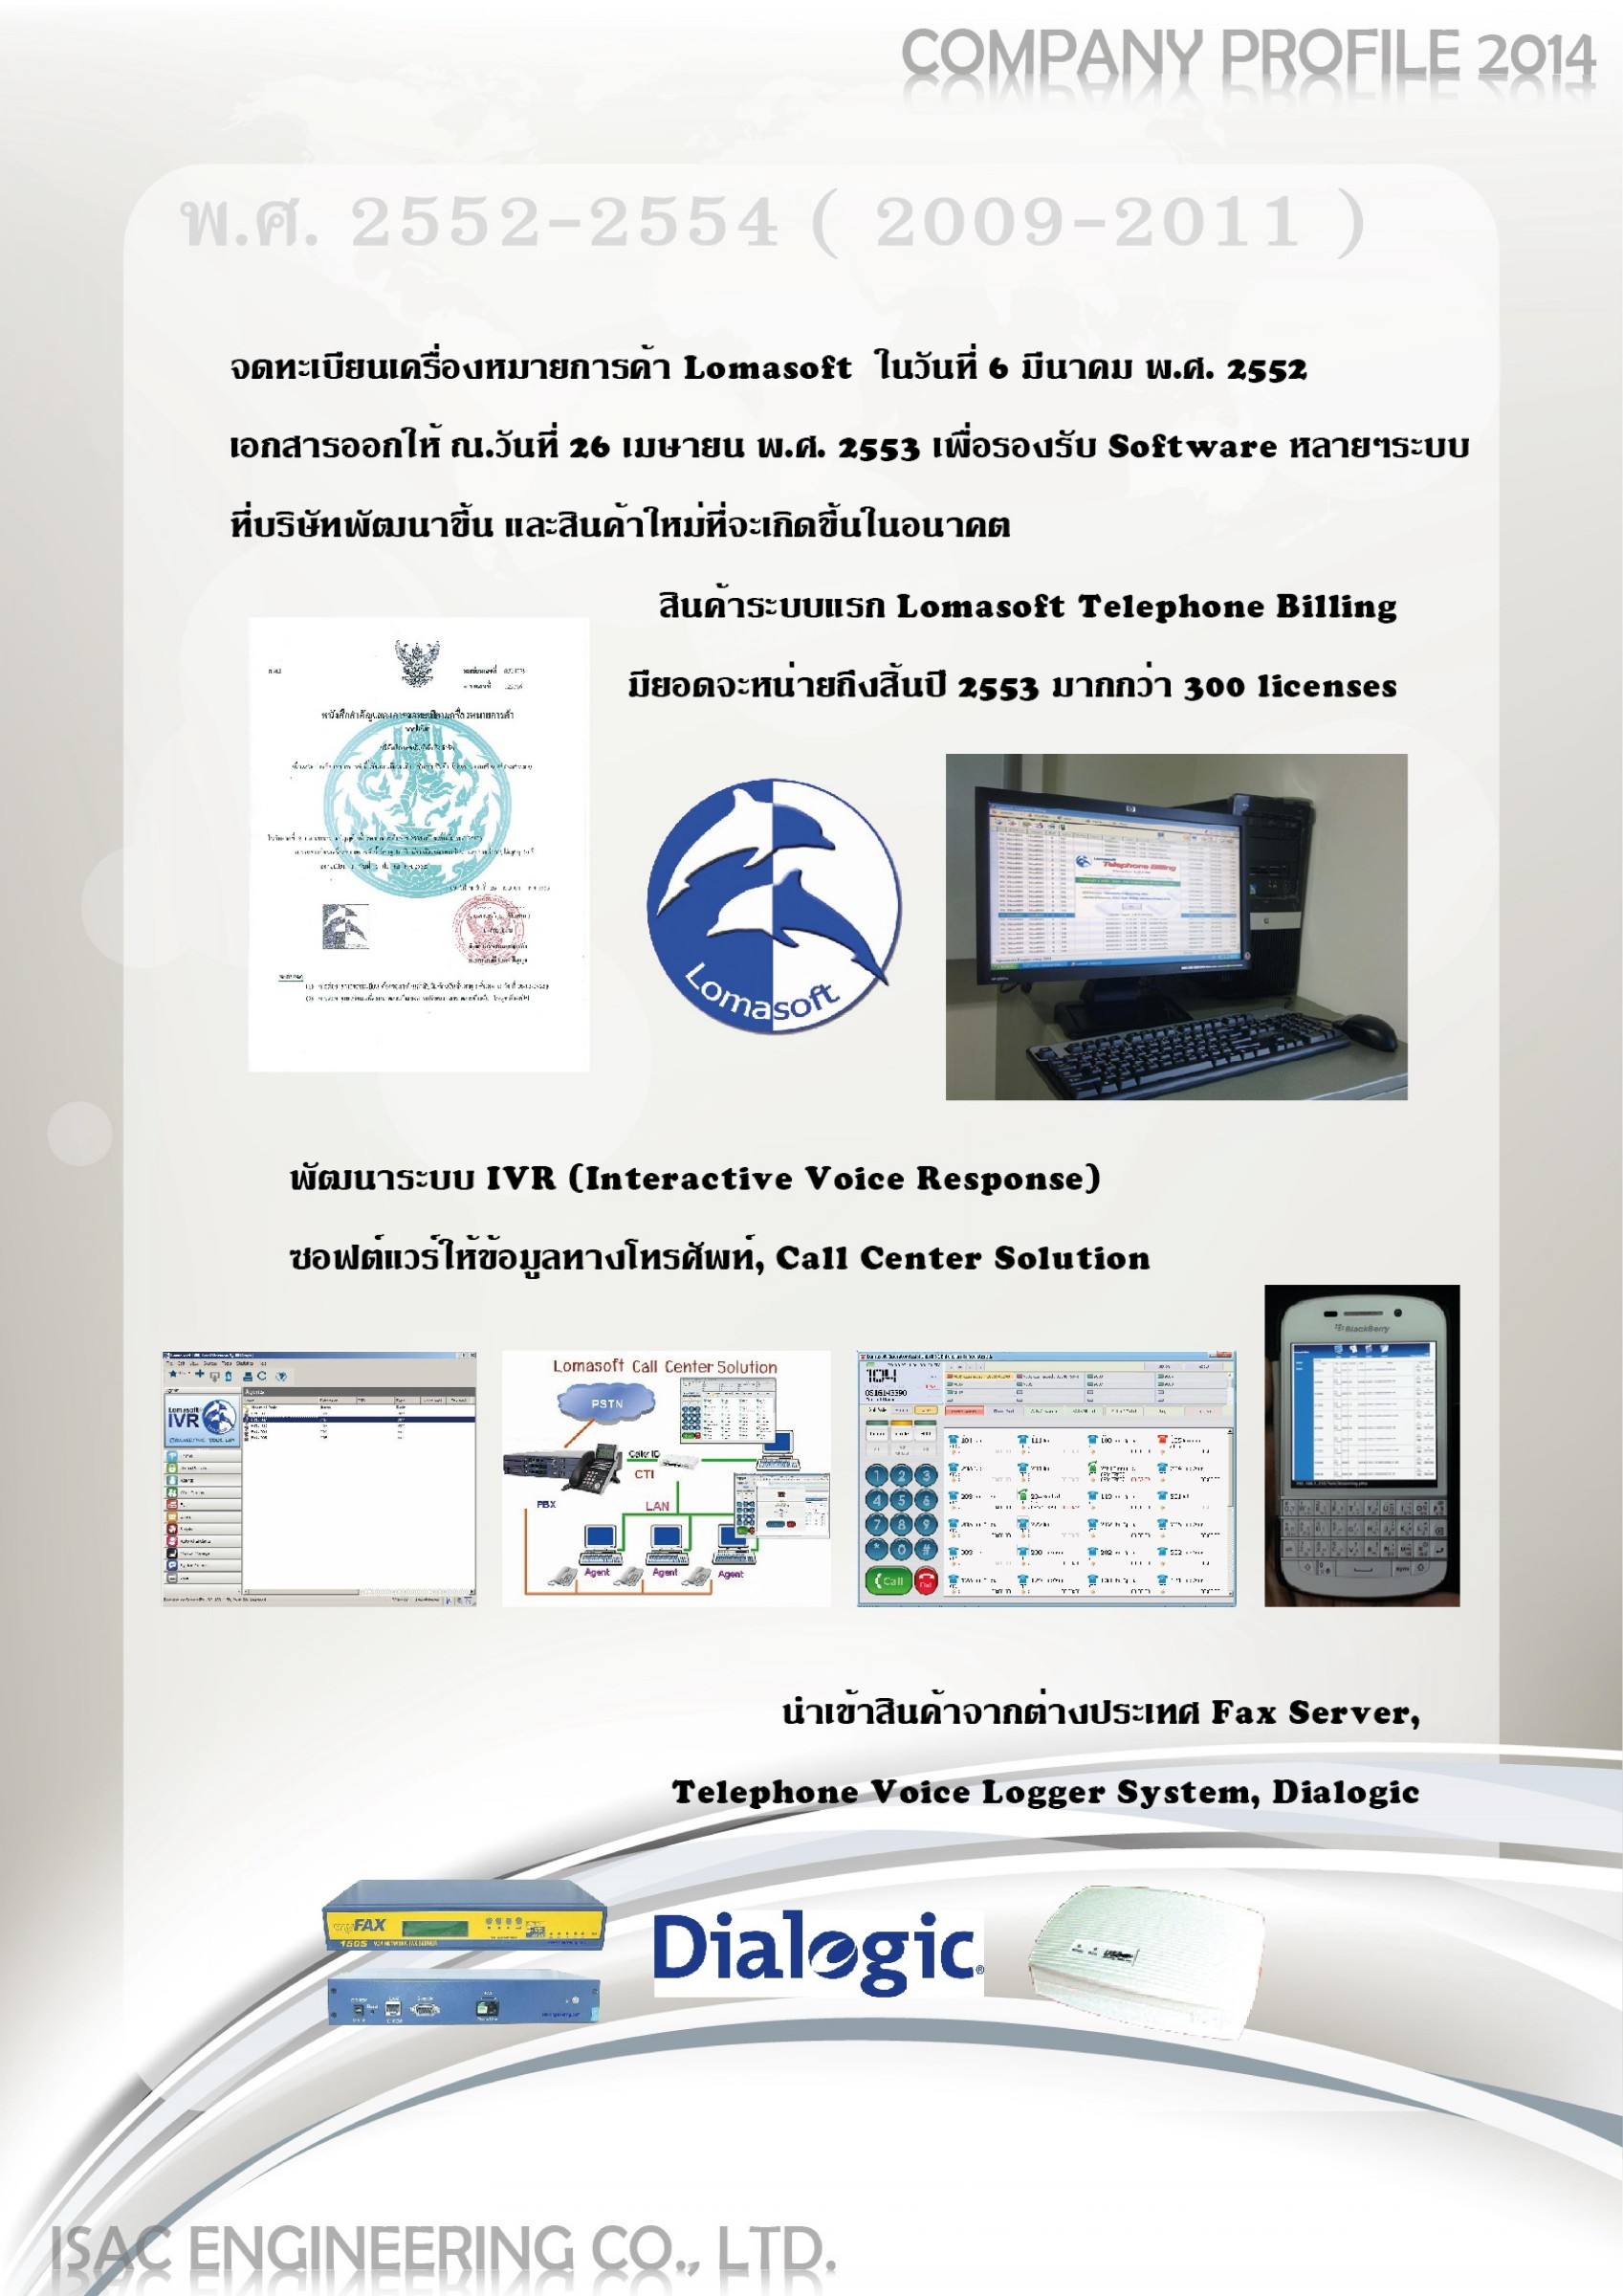 companyprofile2014-page-006